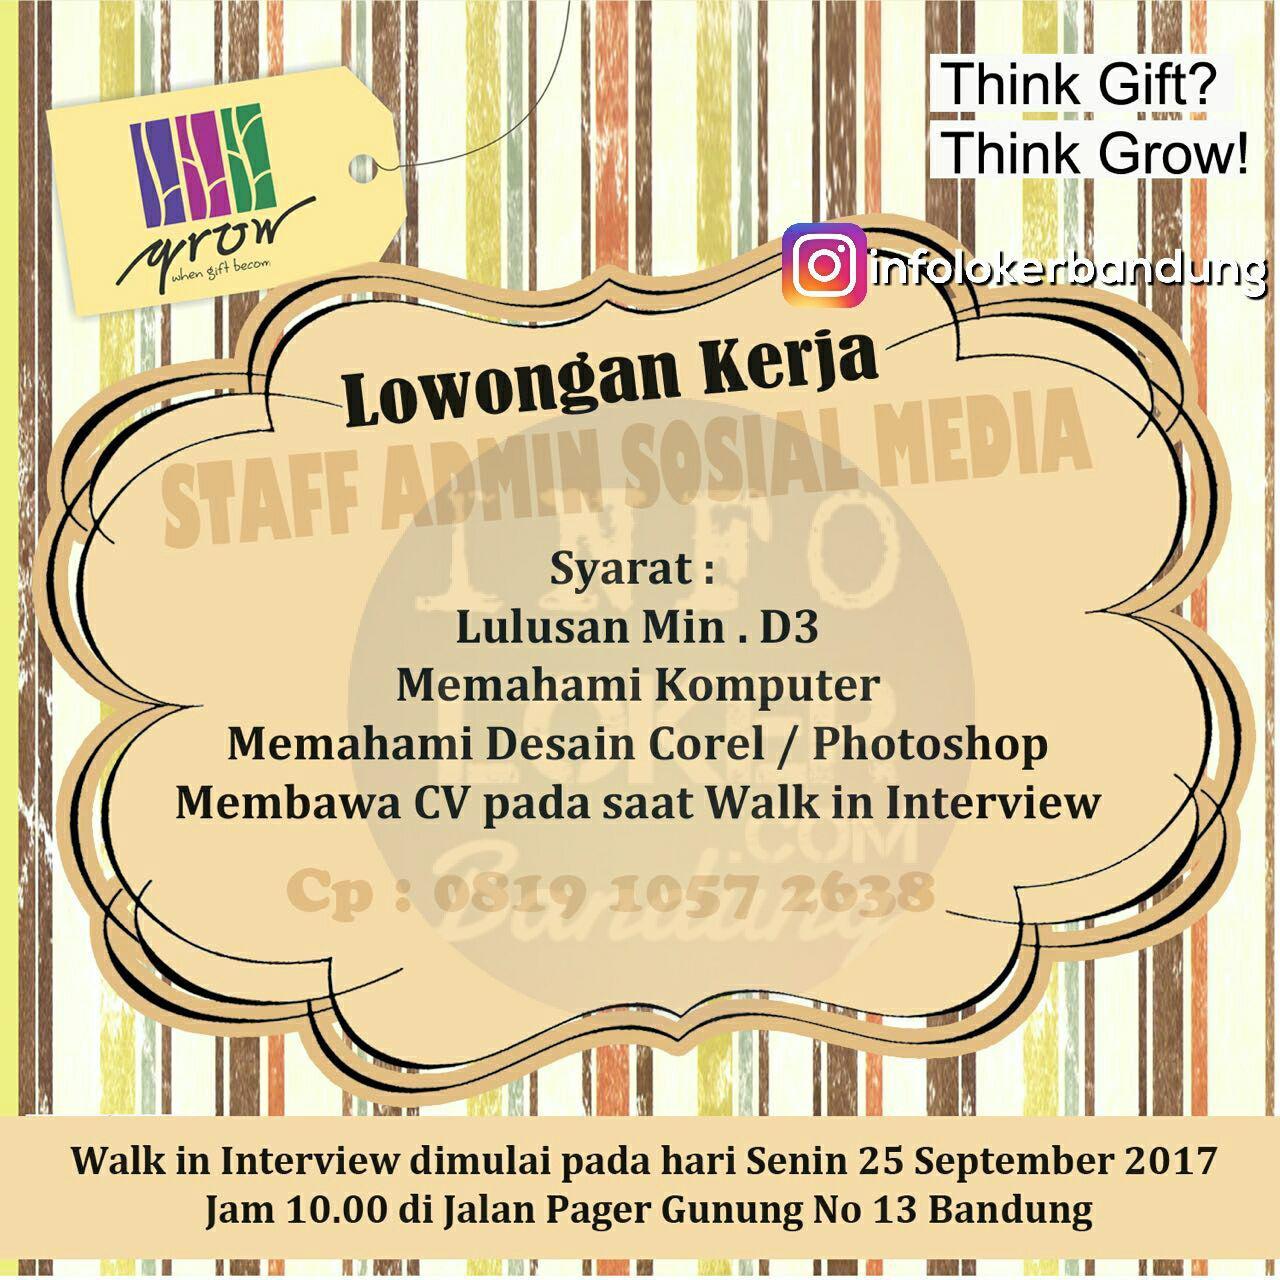 Lowongan Kerja Grow Gift Shop Bandung September 2017